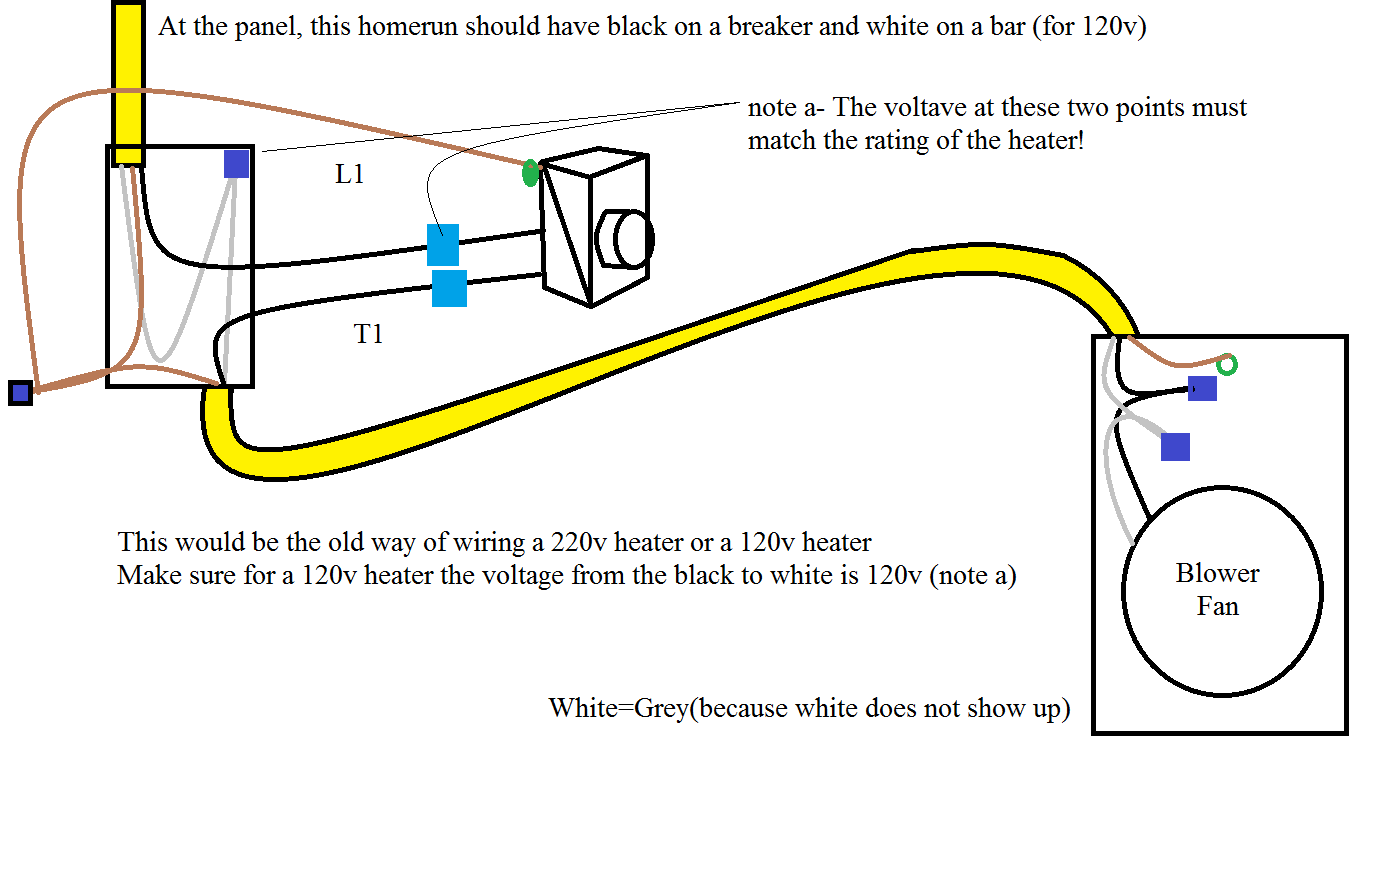 Basic 220v Wiring. European 220v Wiring Diagram Library Rh 4 Yoobi De Plugs Dryer. Wiring. White Wire 220v Wiring 3 Wires At Scoala.co